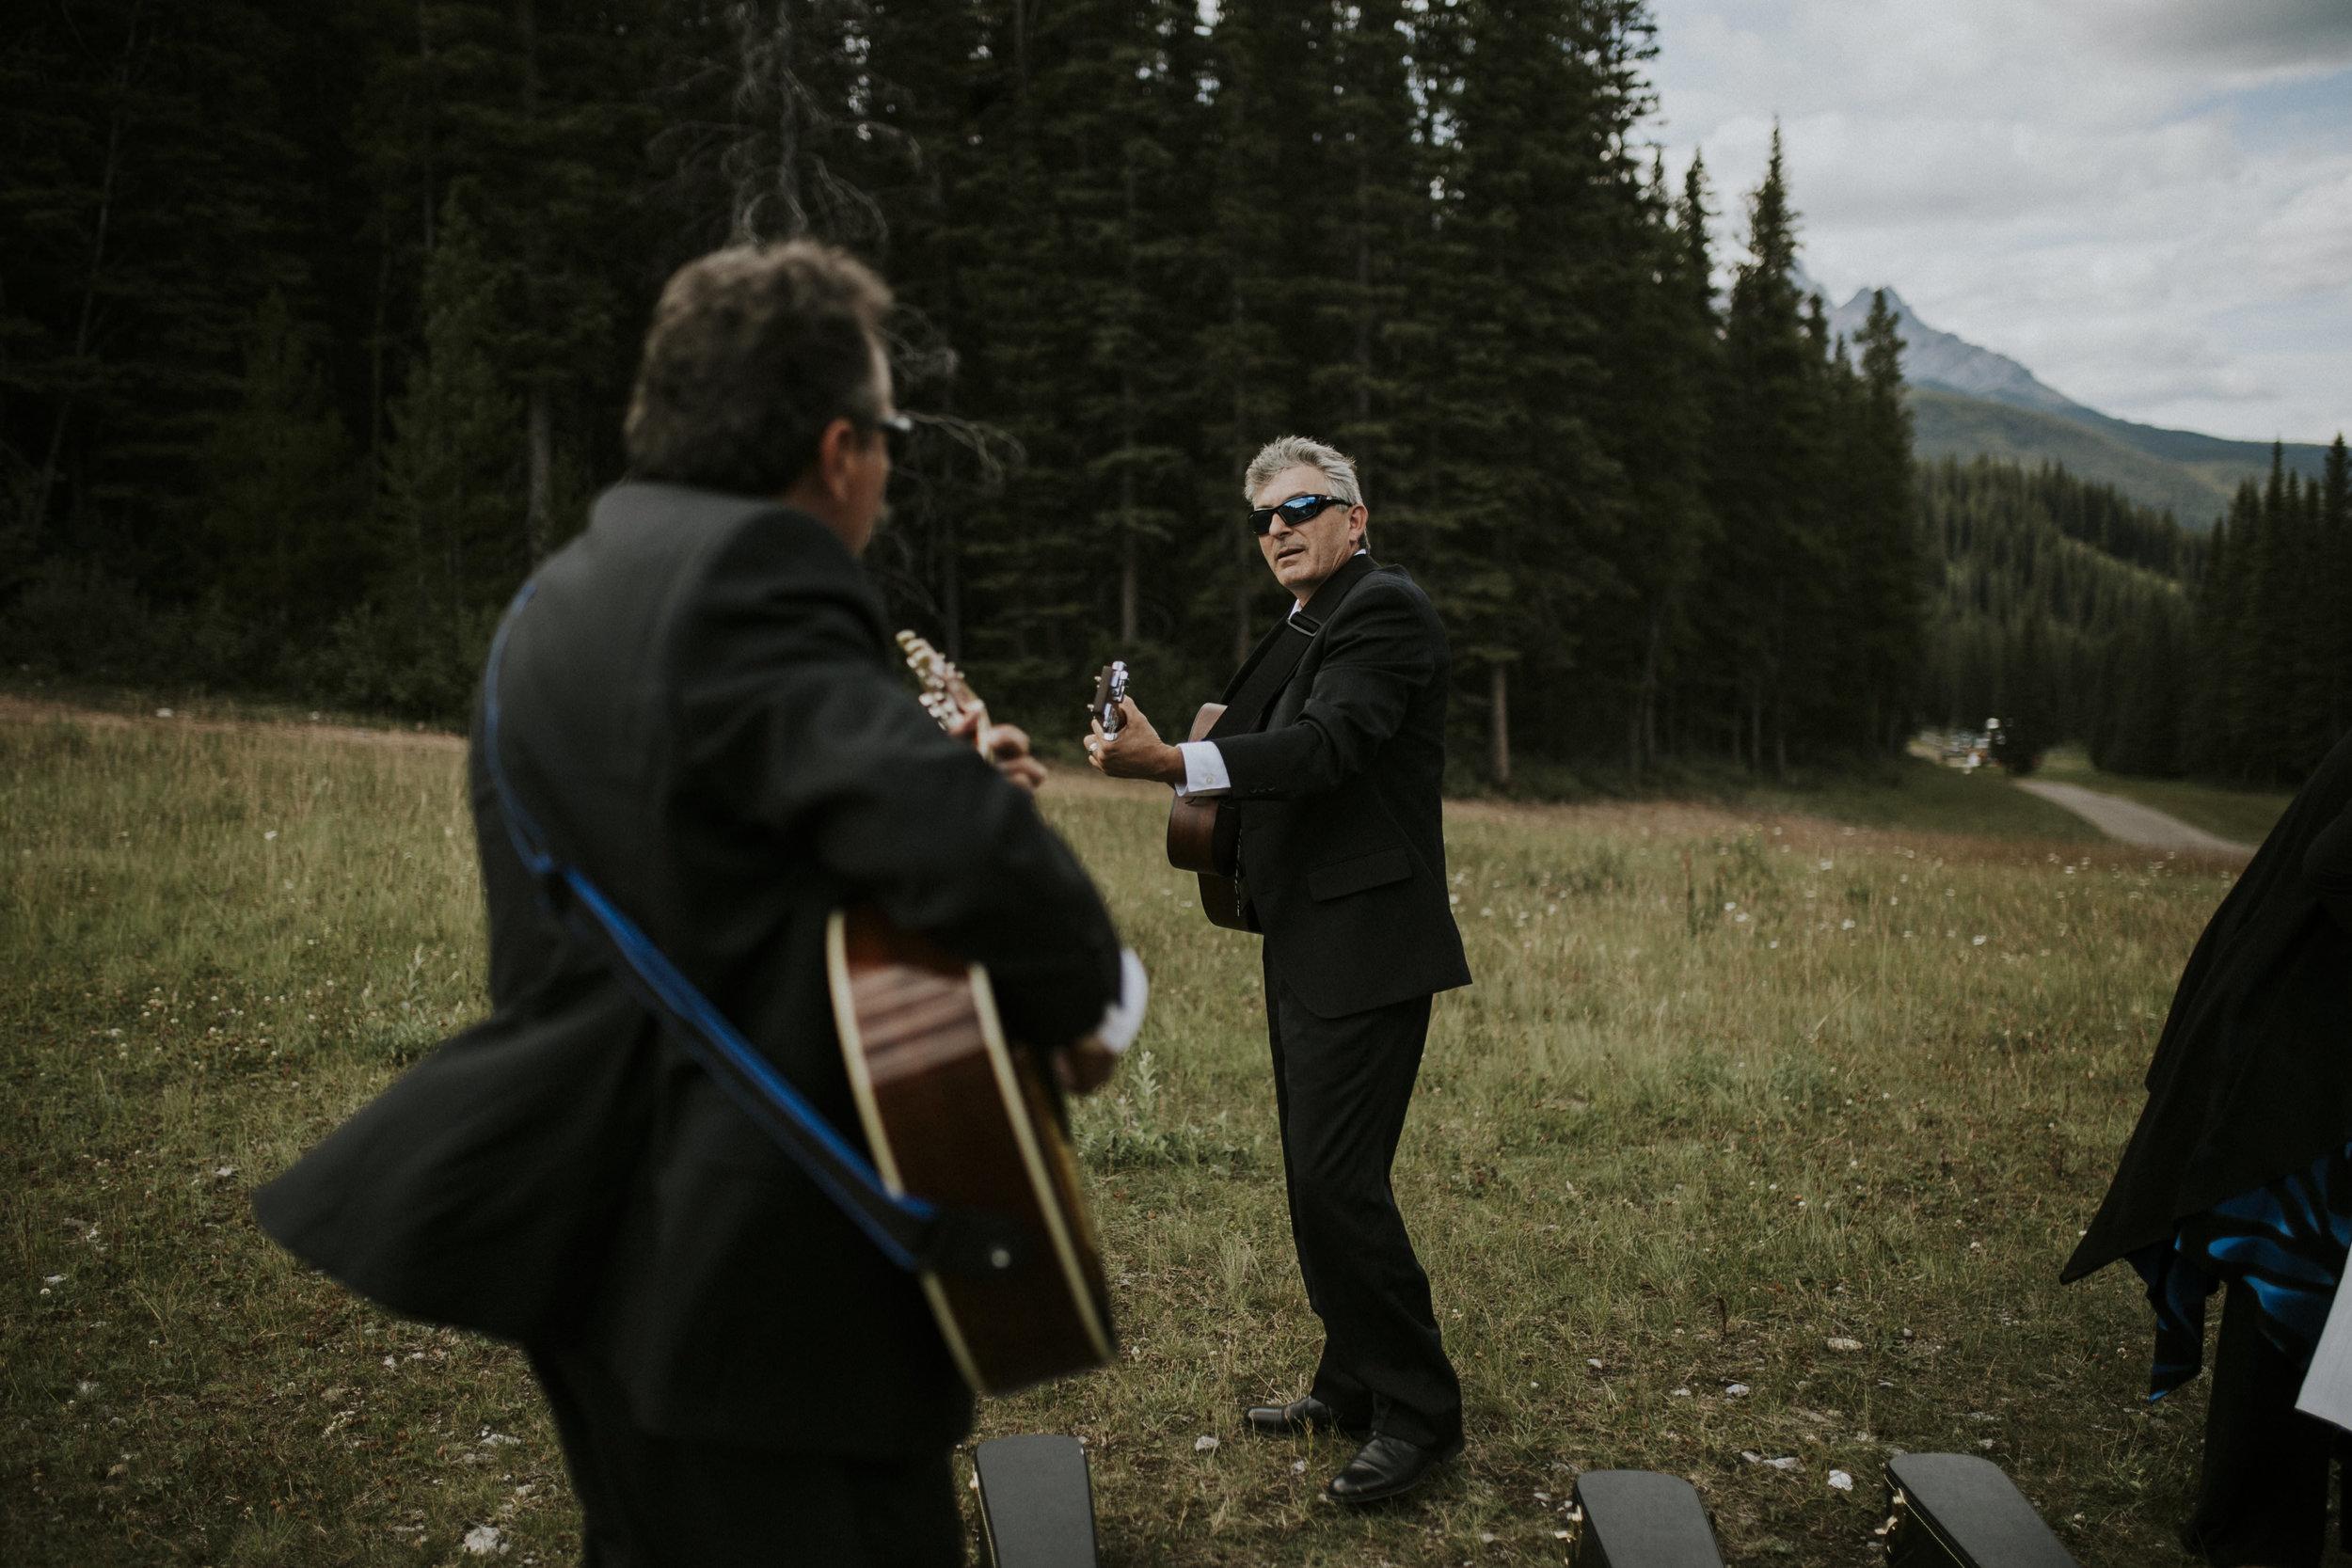 men play guitar at wedding ceremony mt norquay banff